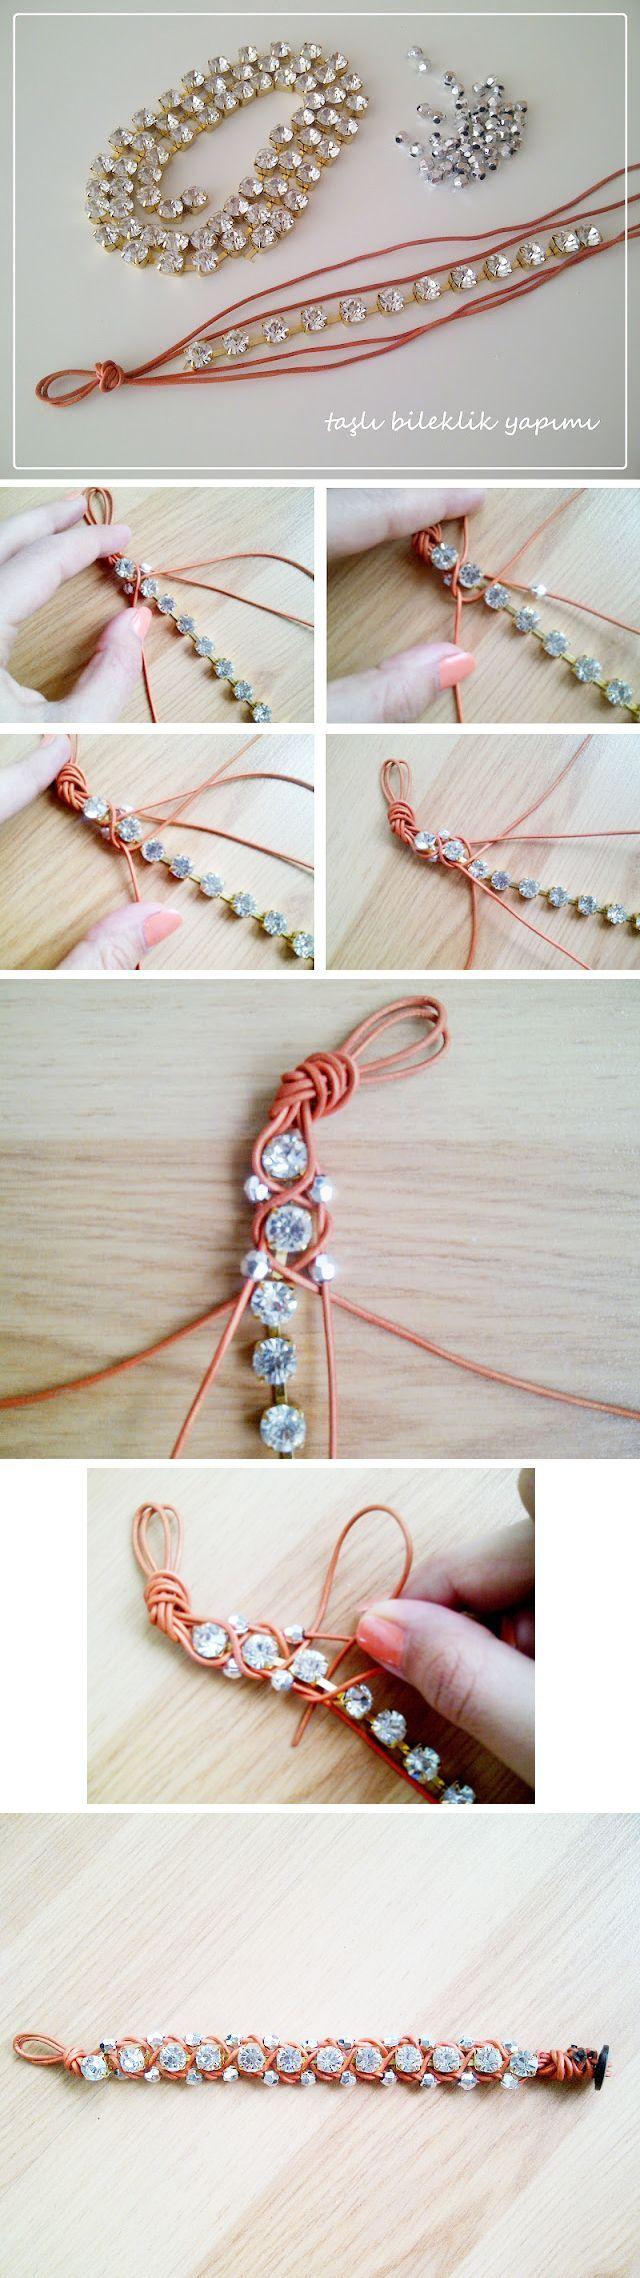 diy rhinestone-bracelet